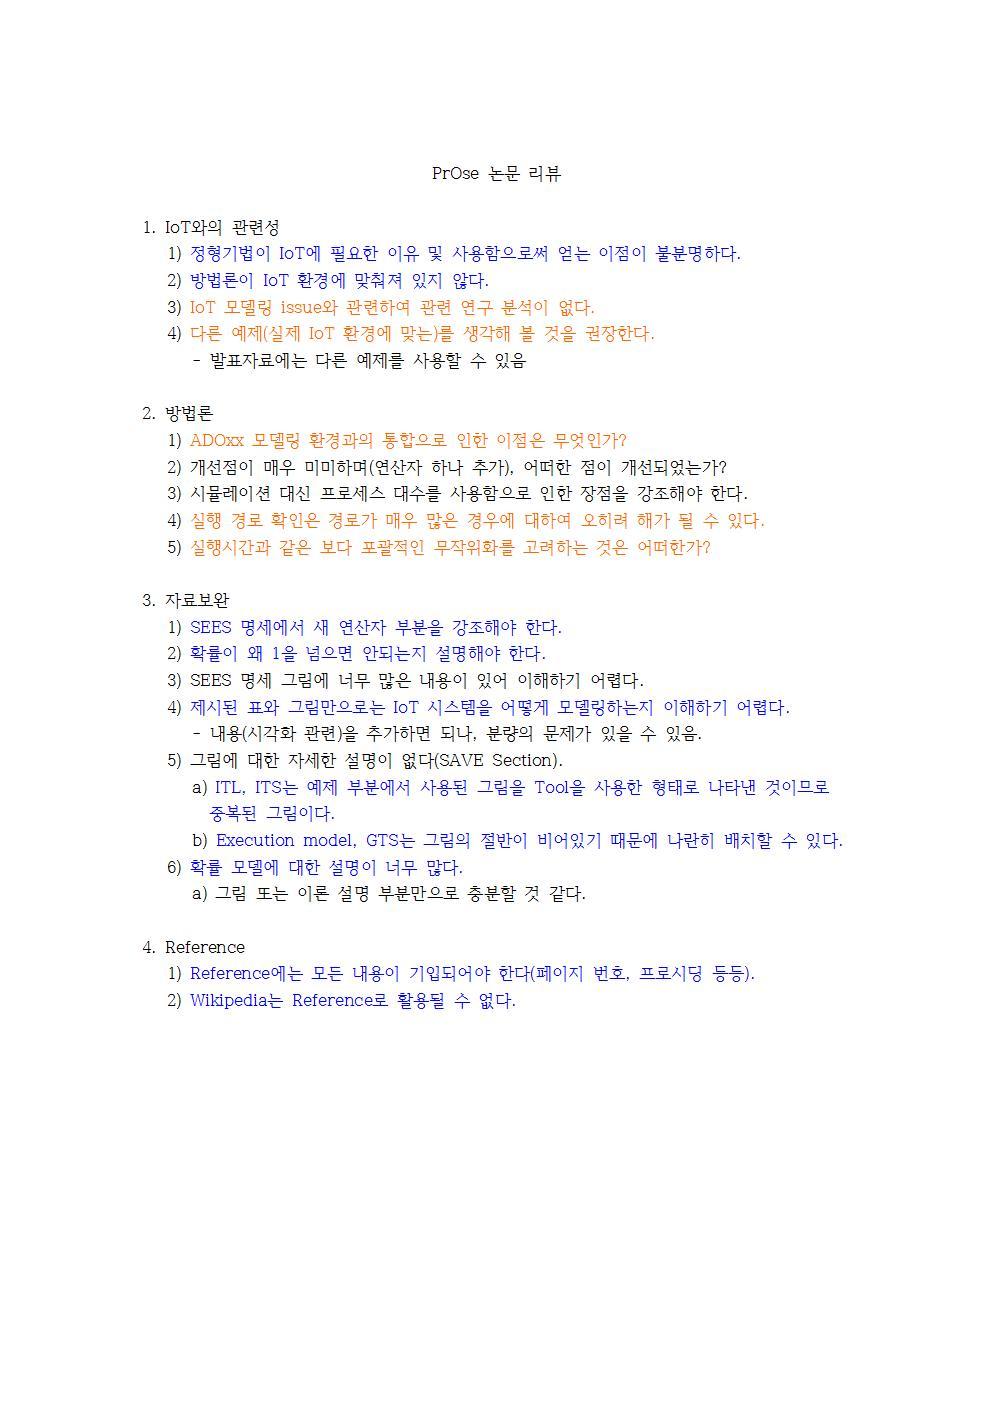 M-[18-053-PP-17]-[Paper Review]001.jpg